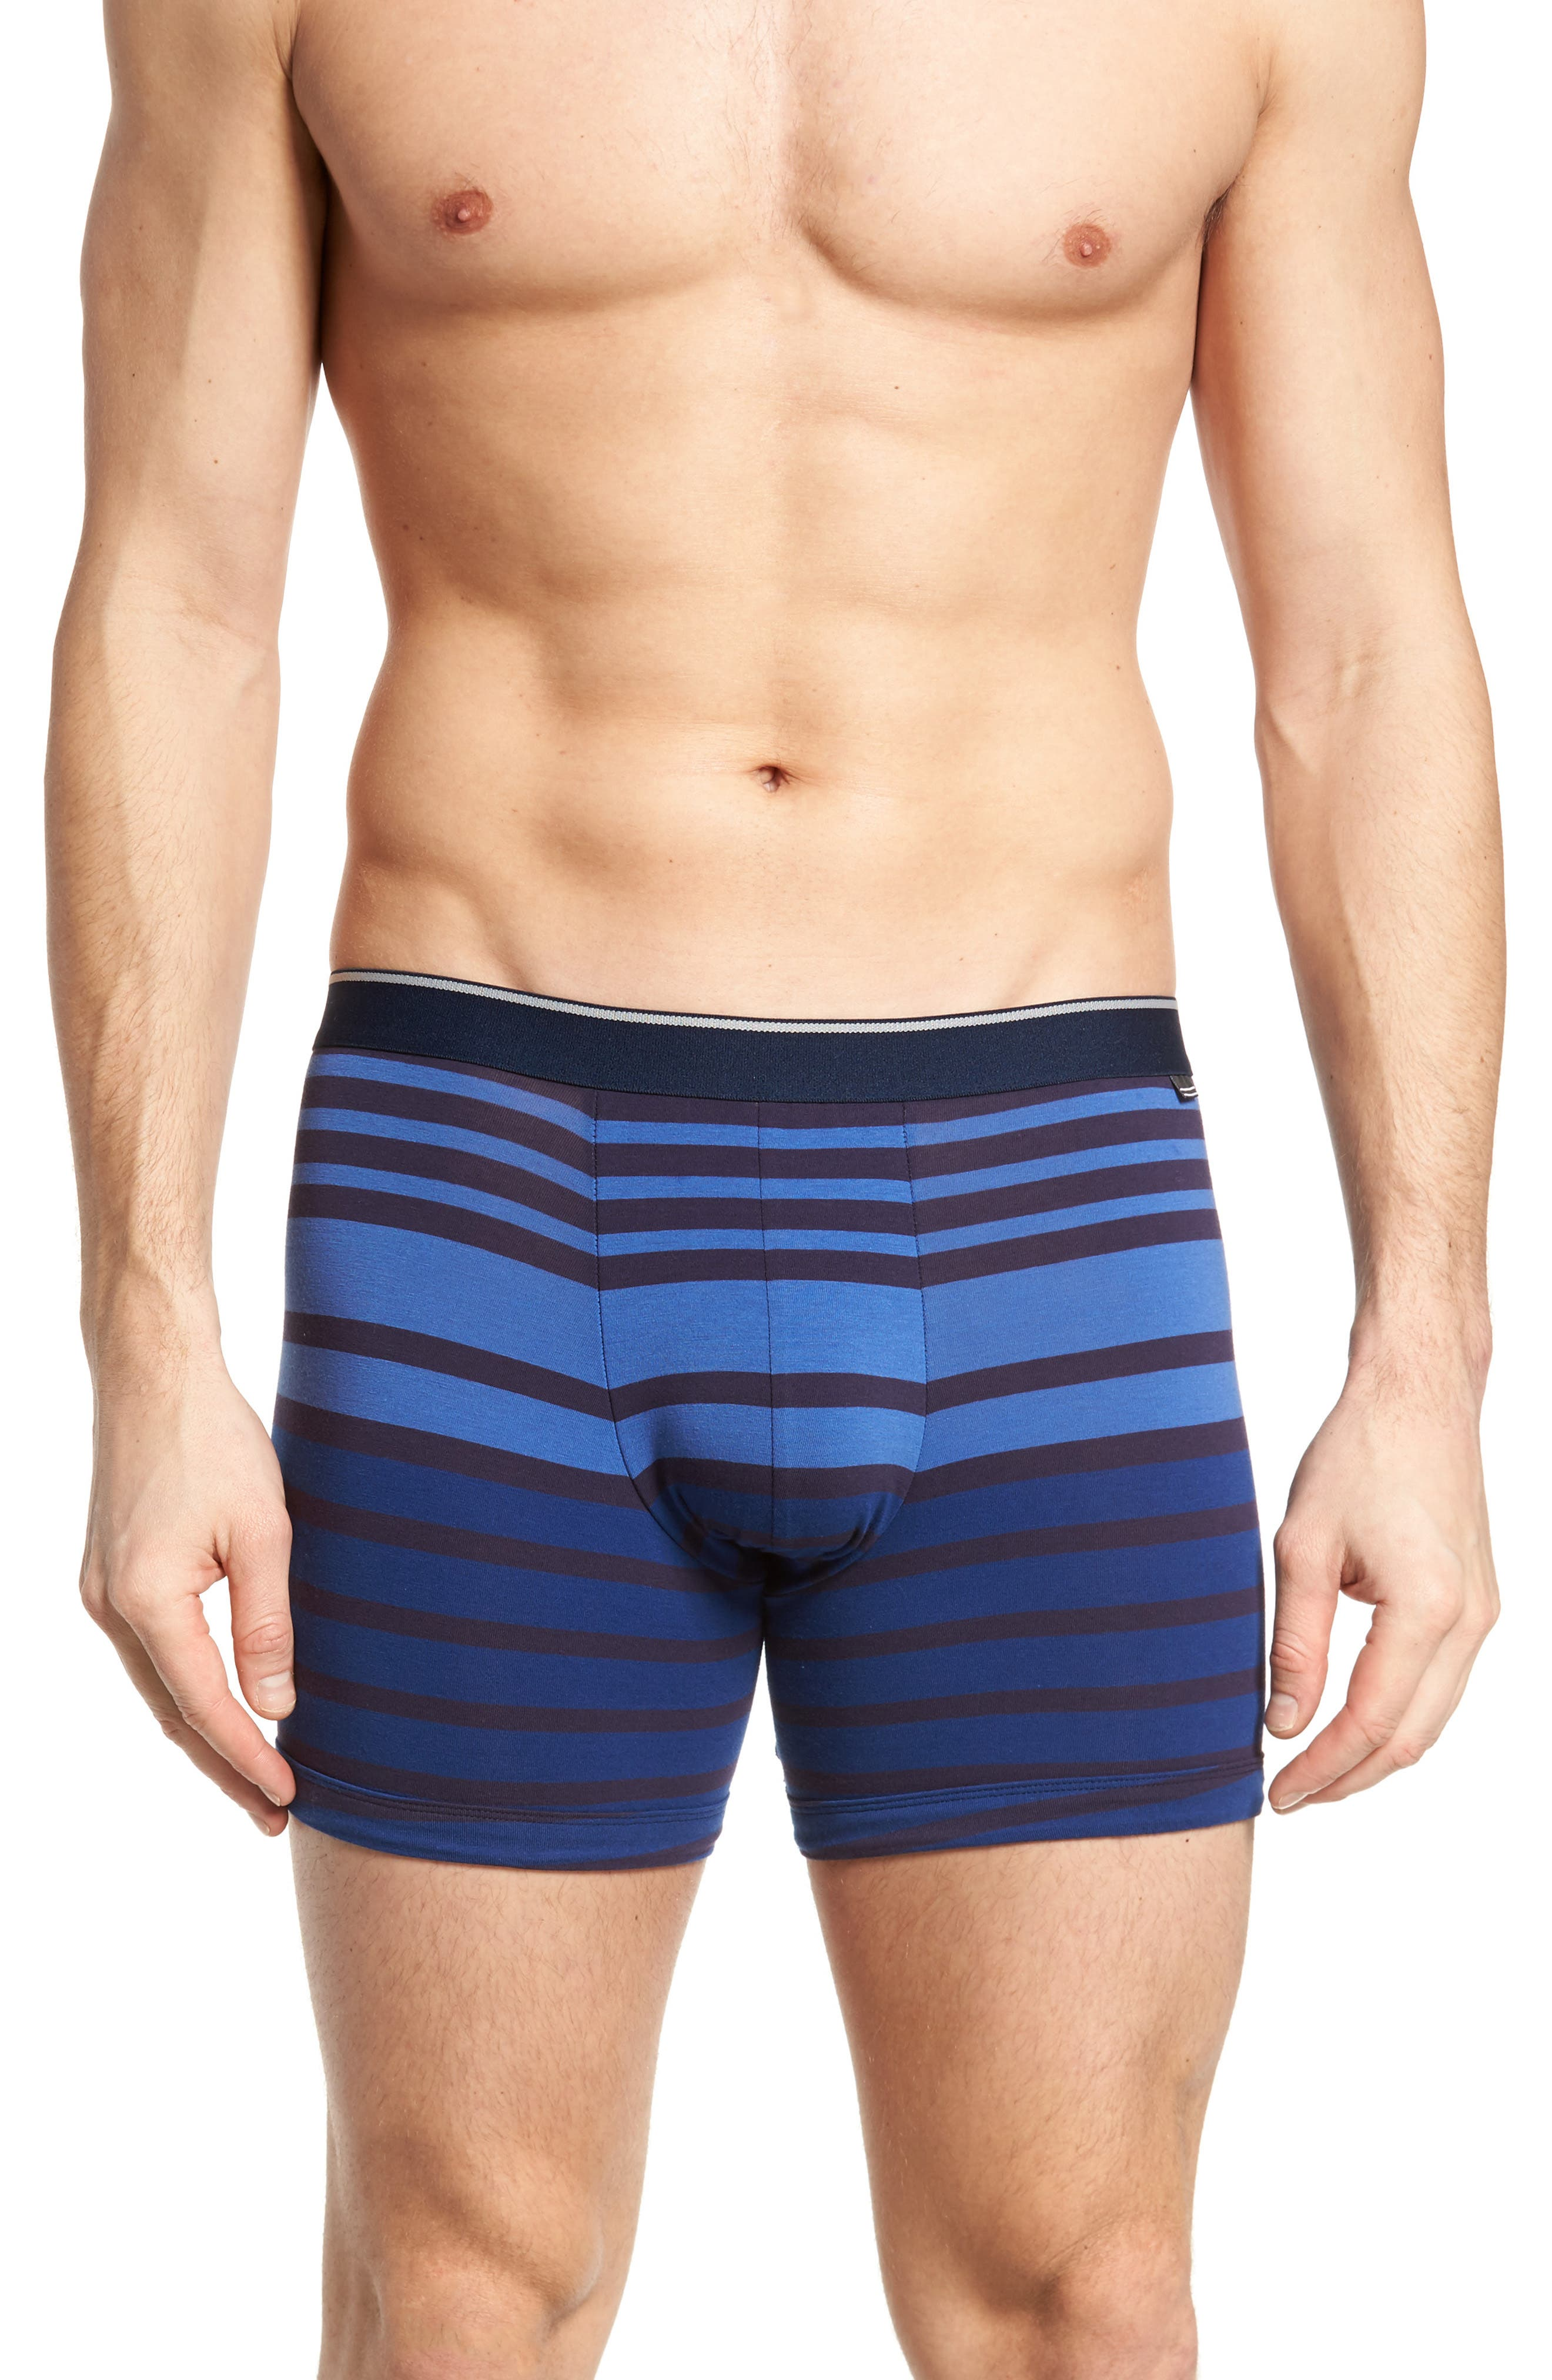 3-Pack Boxer Briefs,                             Alternate thumbnail 2, color,                             Navy/ Navy-Blue Stripe